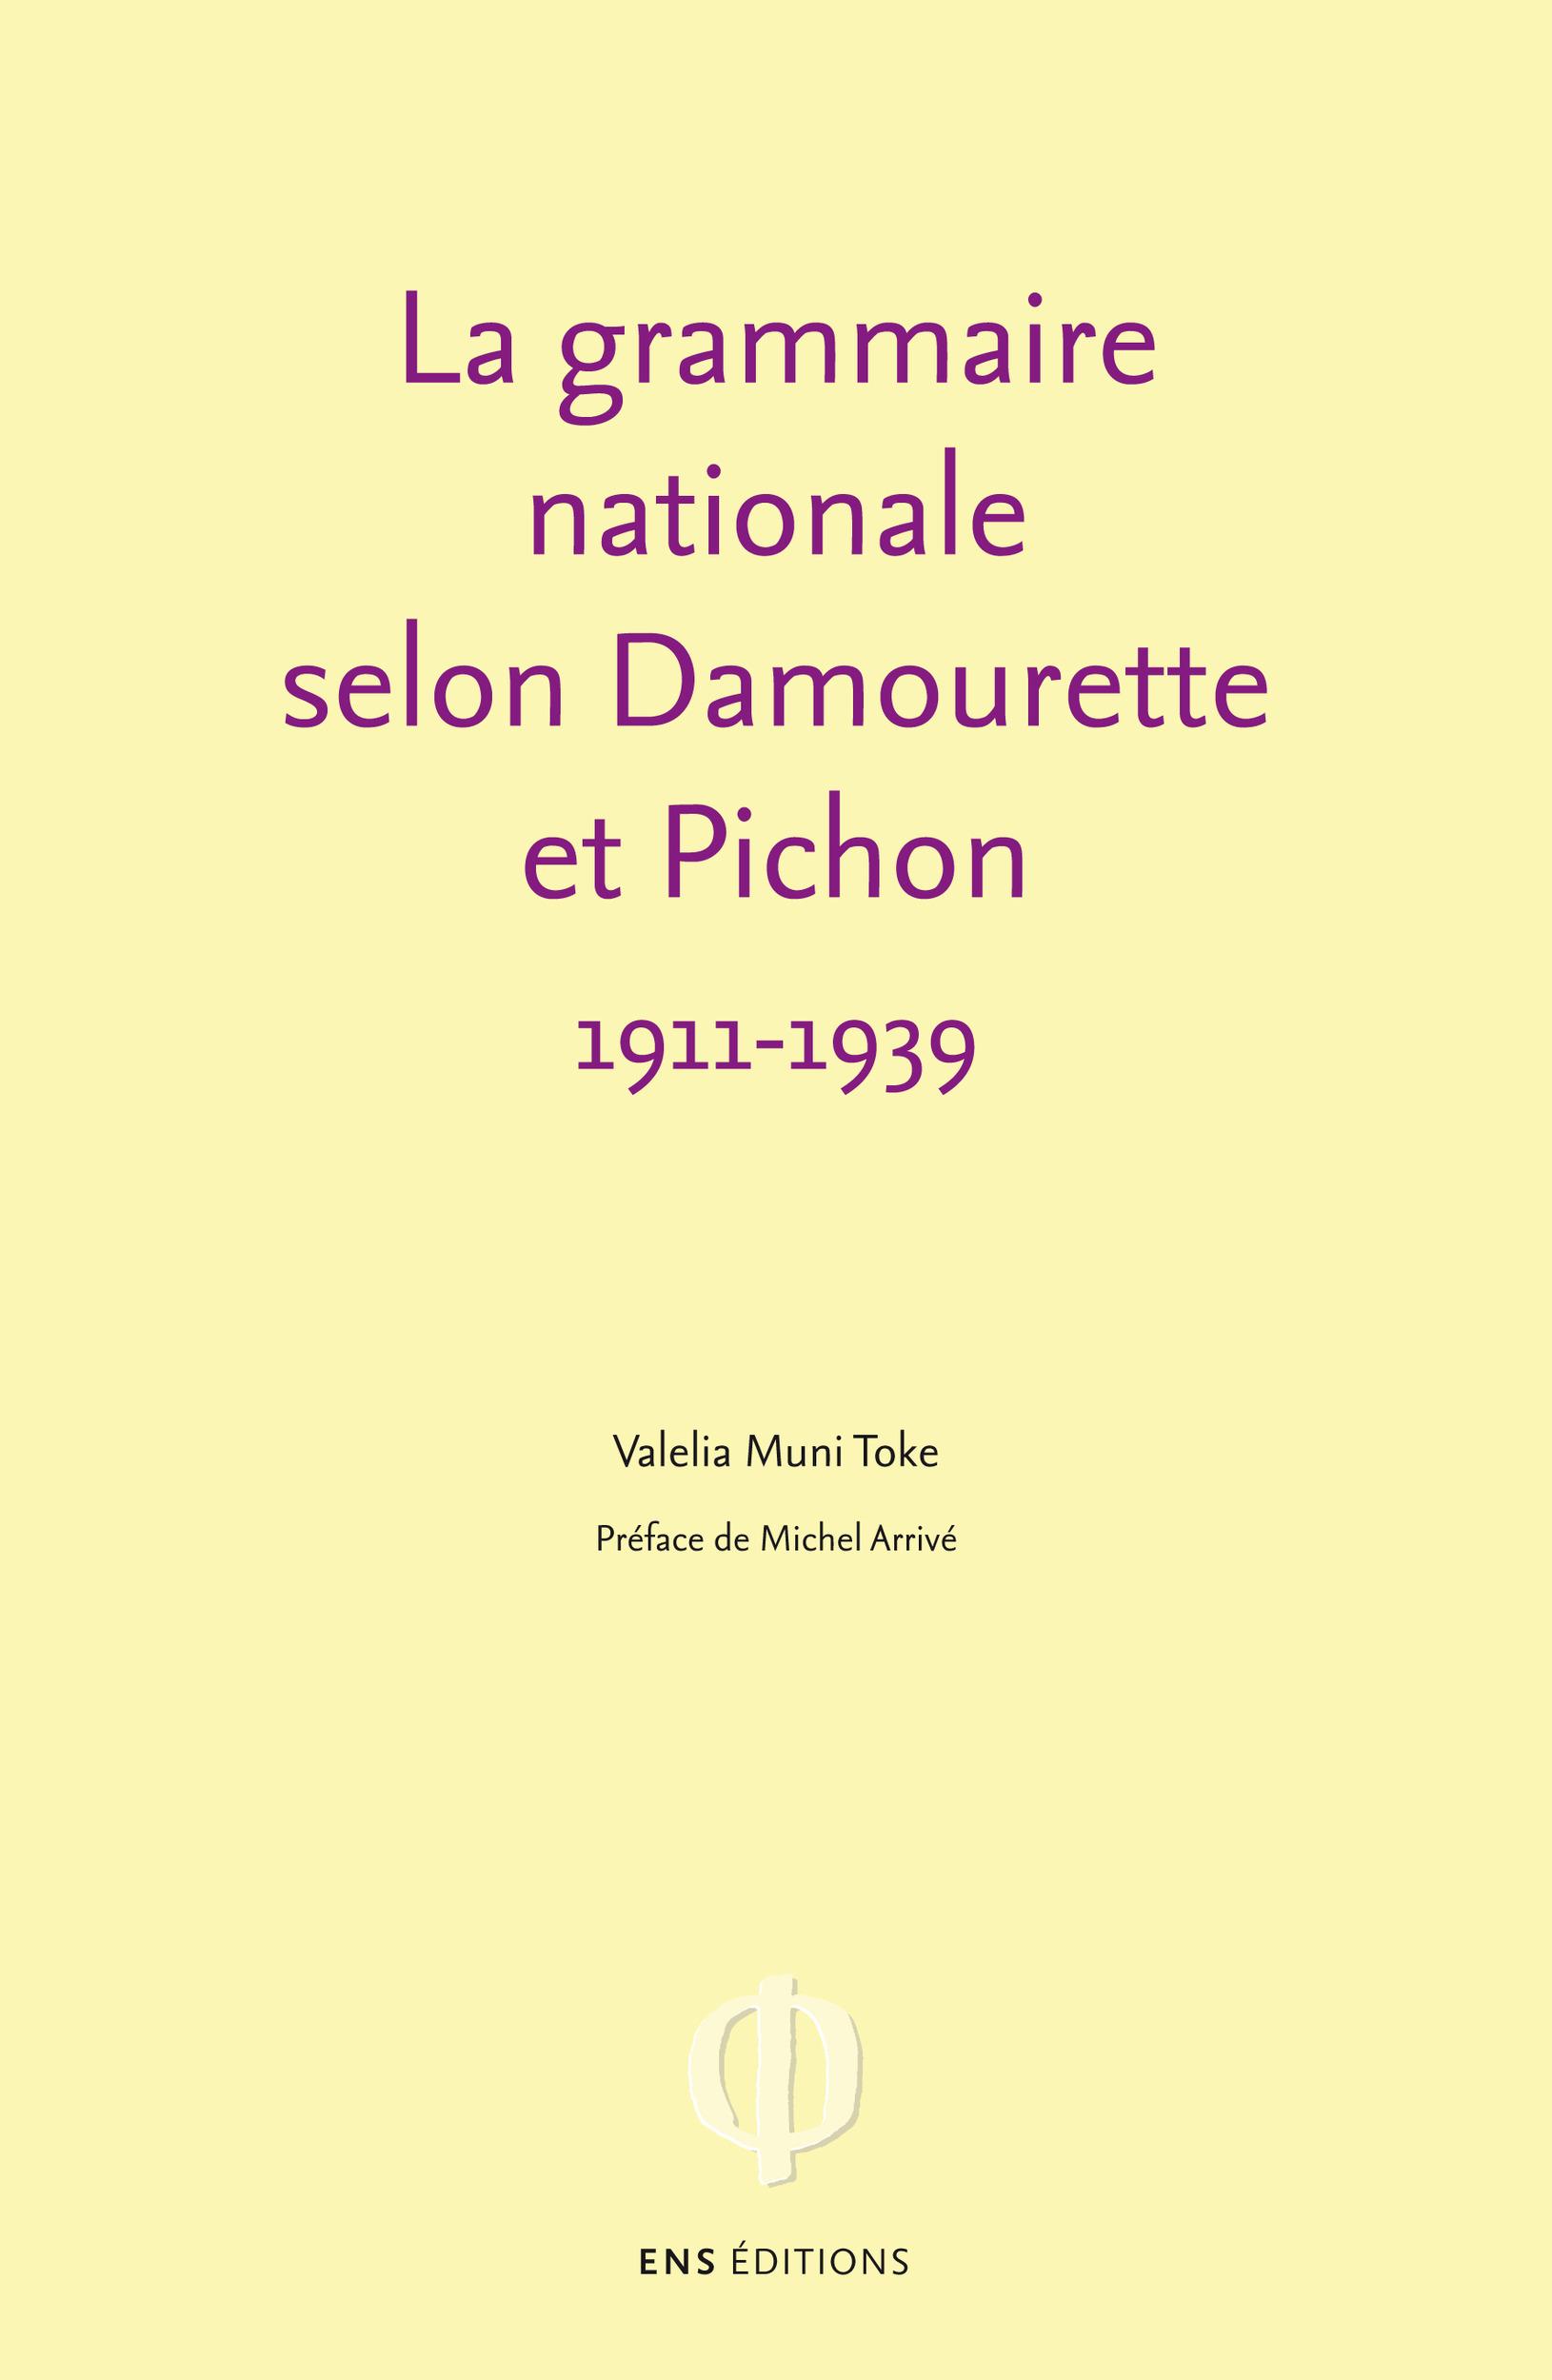 La grammaire nationale selon Damourette et Pichon (1911-1939)  - Valelia Muni Toke